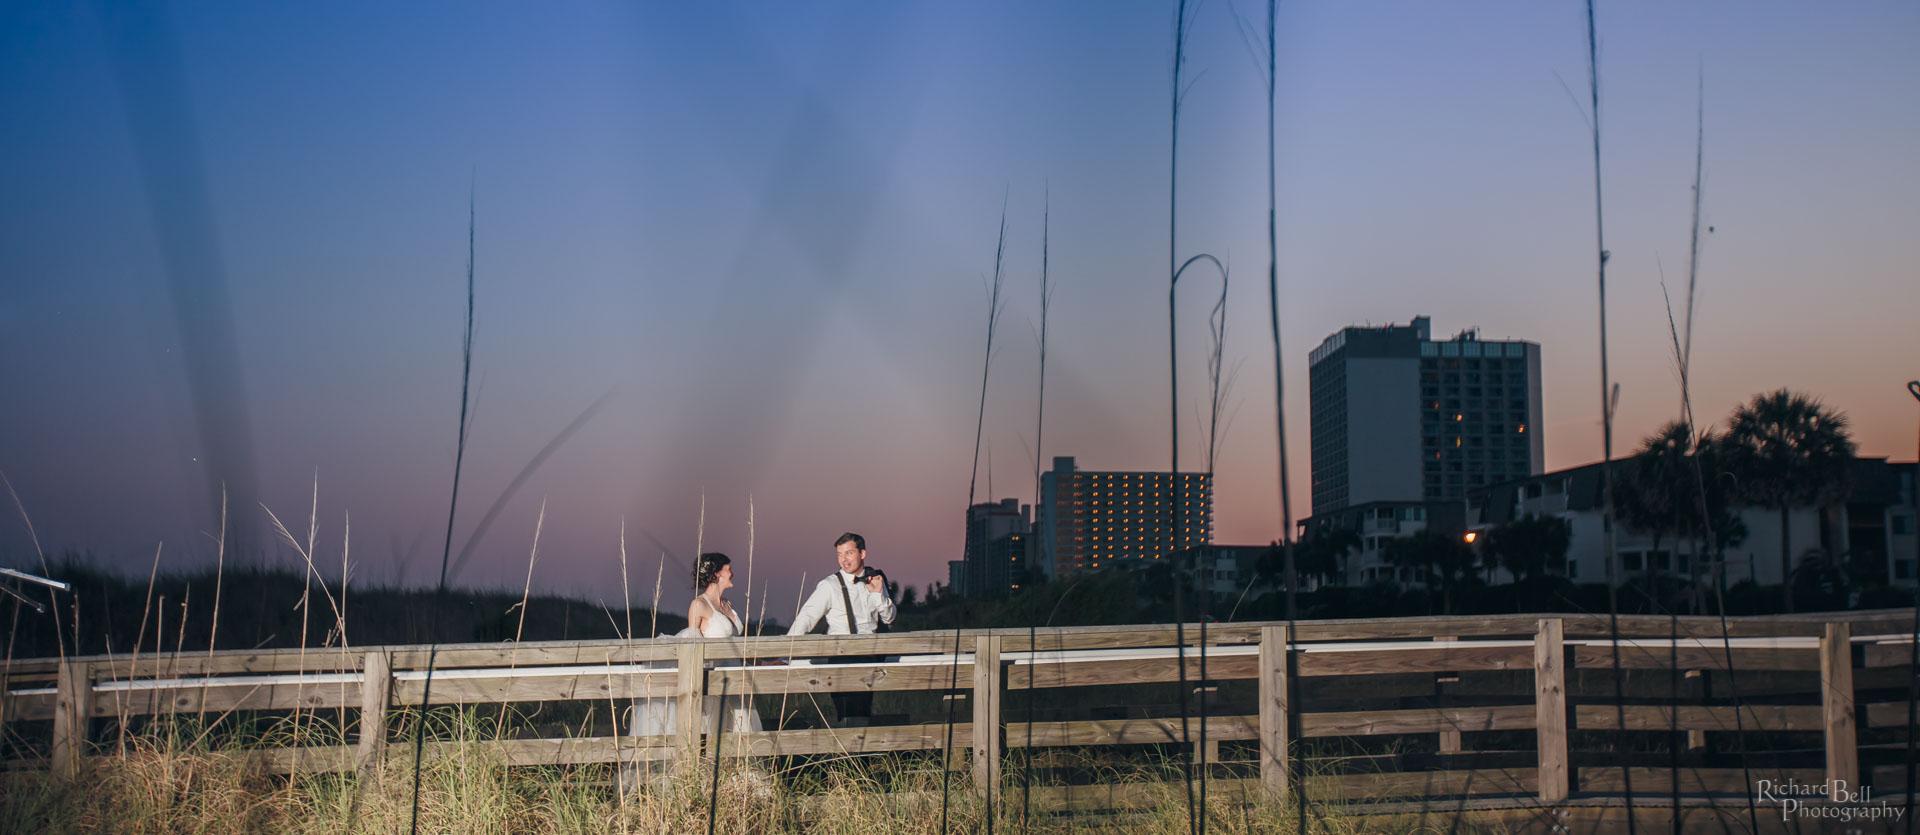 Bride and Groom in Myrtle Beach